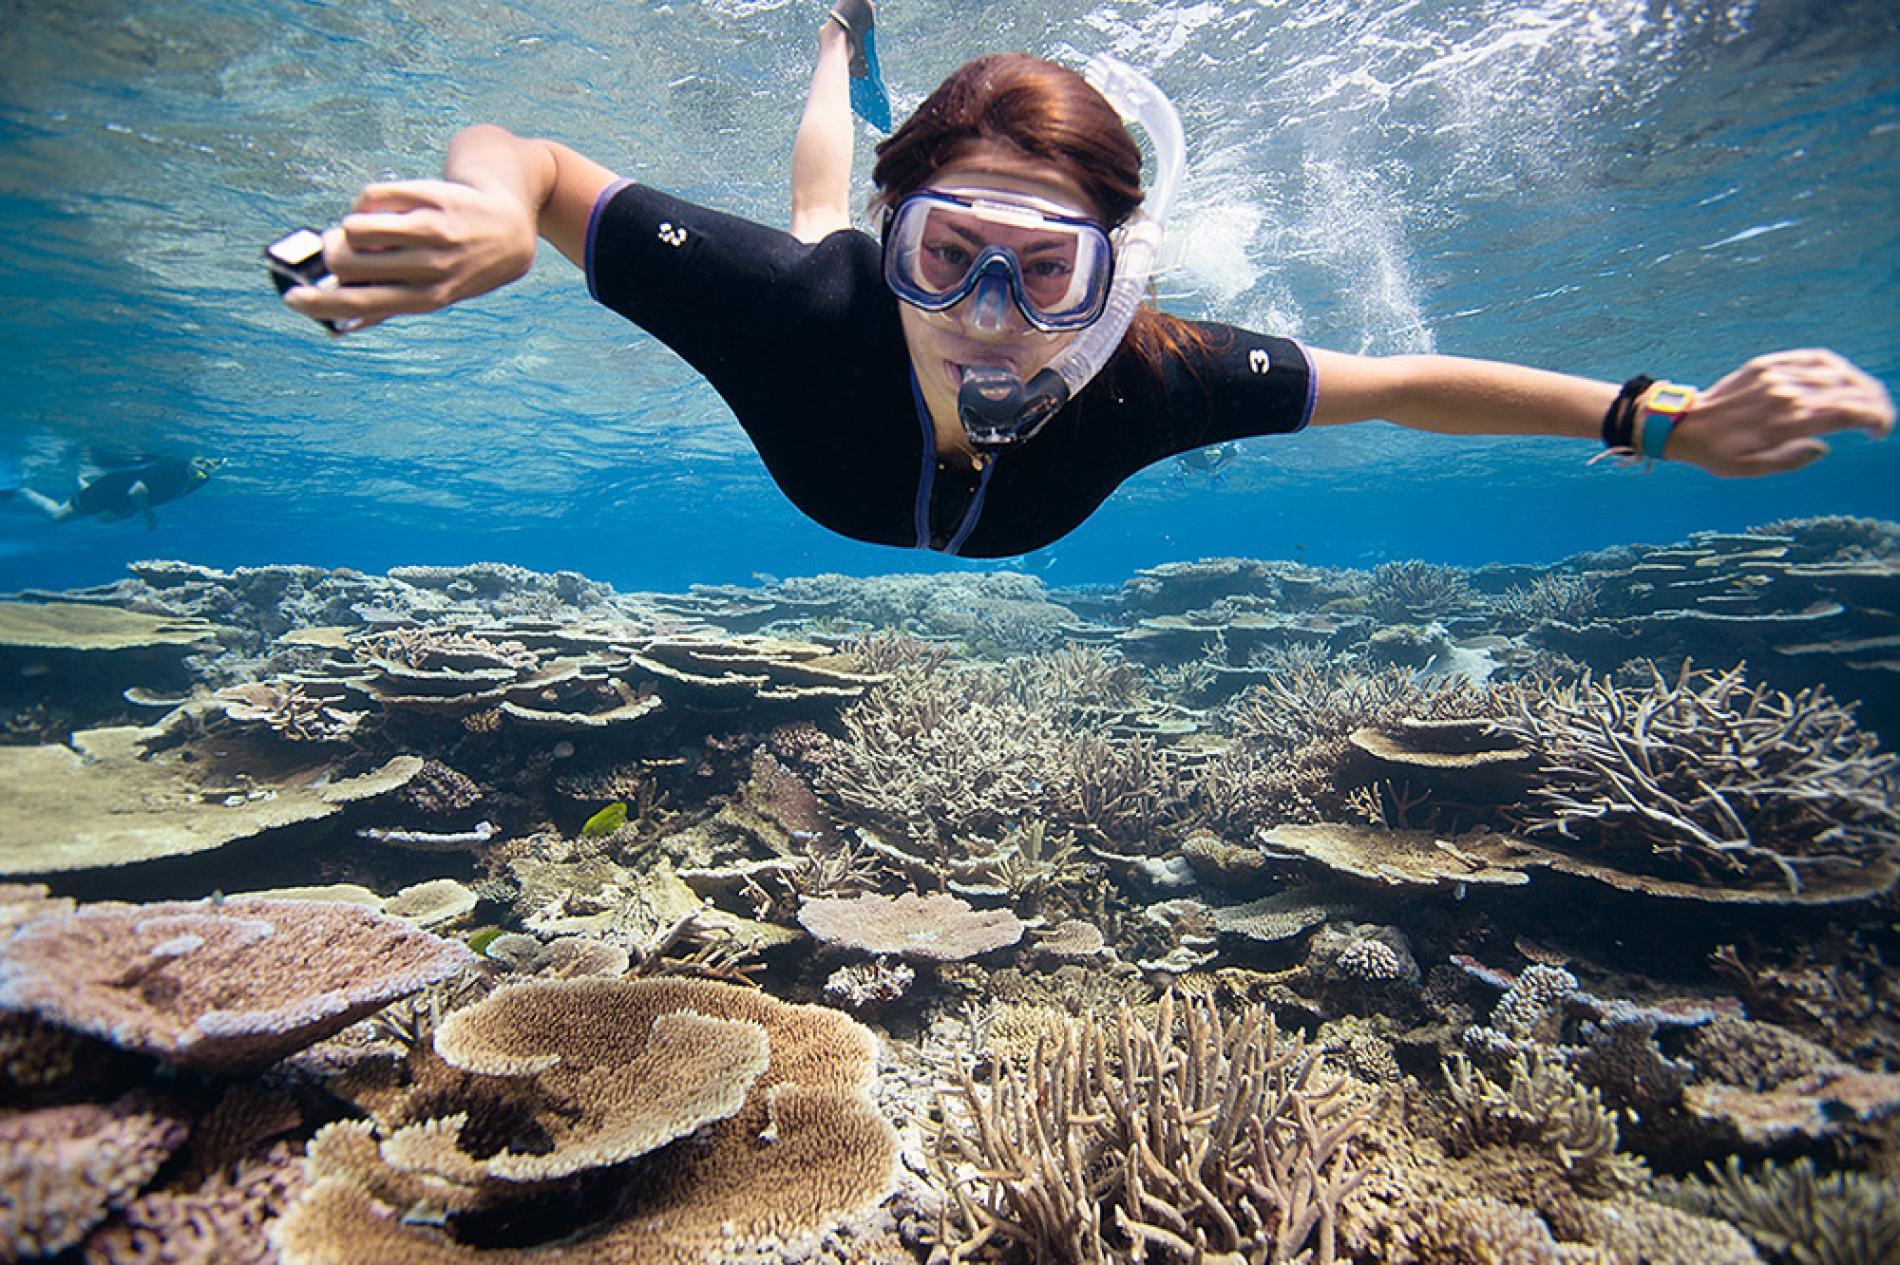 school student trips  u0026 travel programs to australia 2019